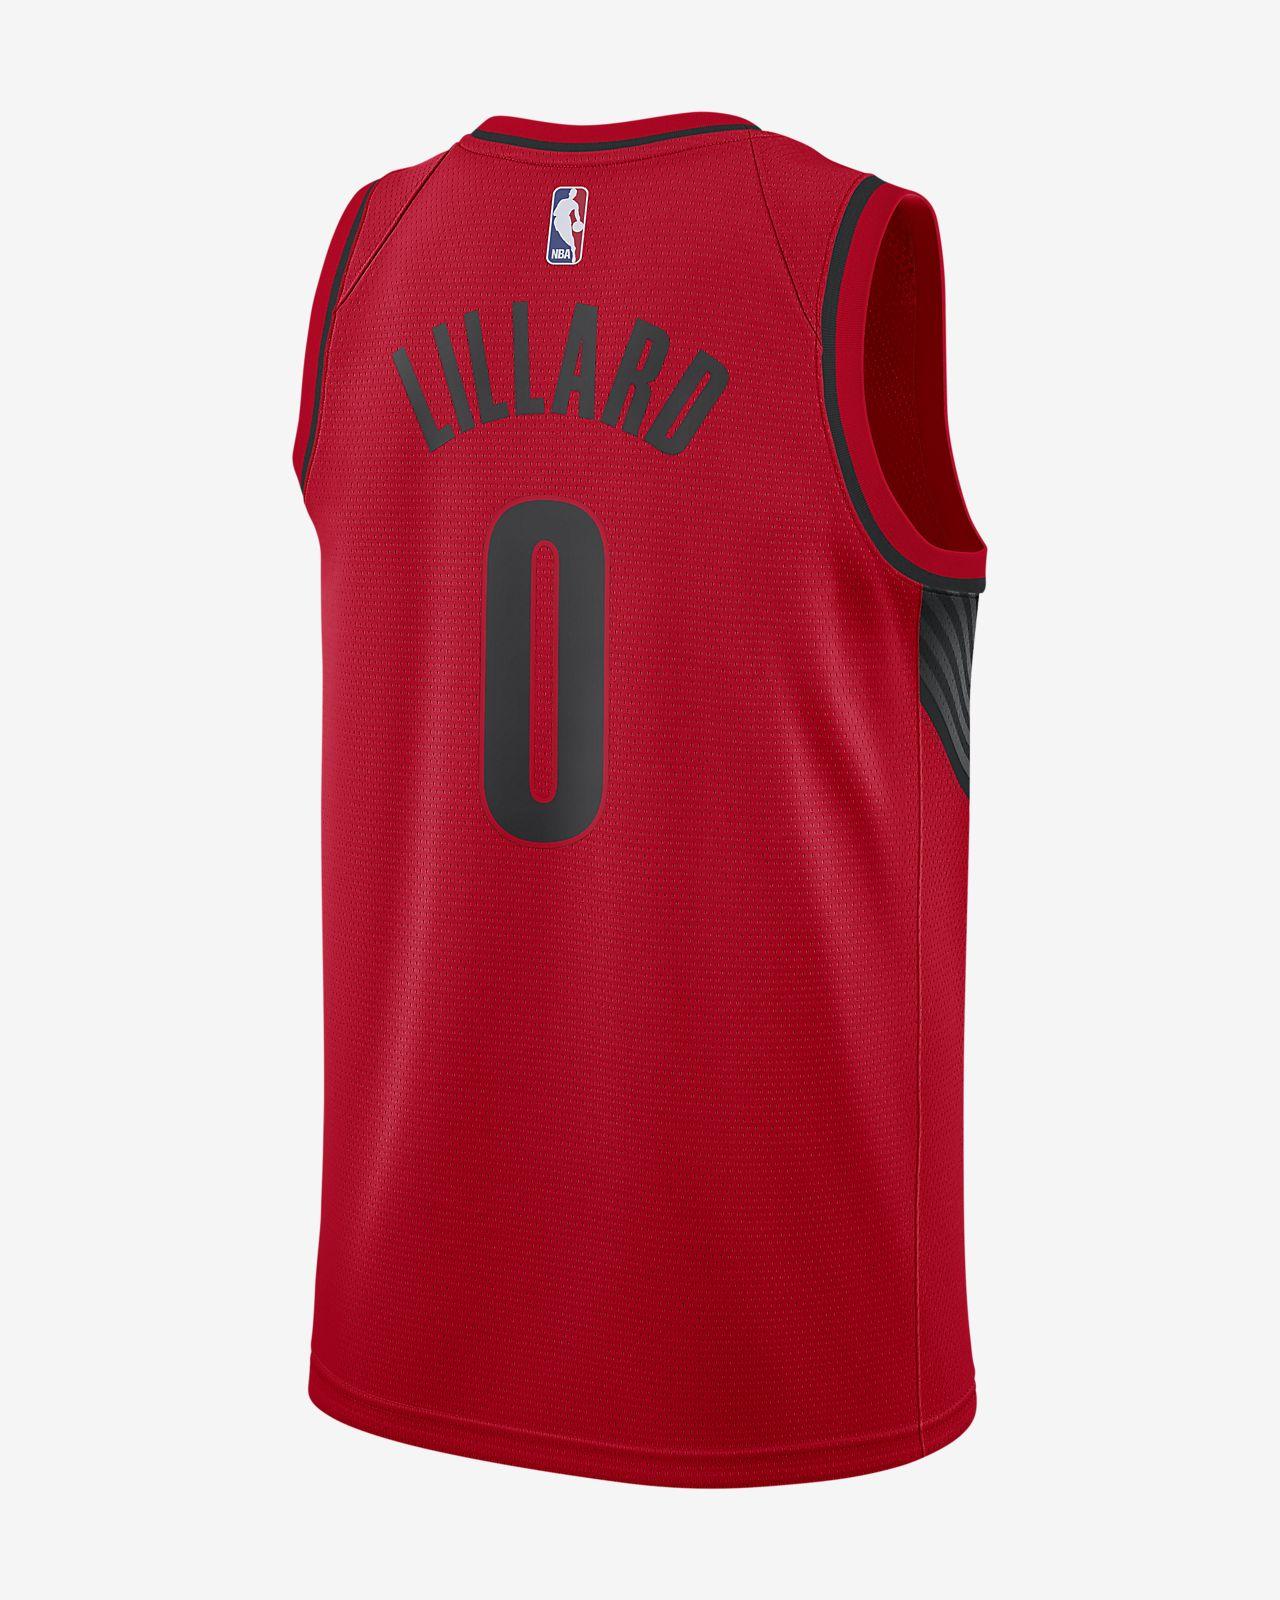 1e47b96bc7e ... Damian Lillard Statement Edition Swingman (Portland Trail Blazers)  Men's Nike NBA Connected Jersey